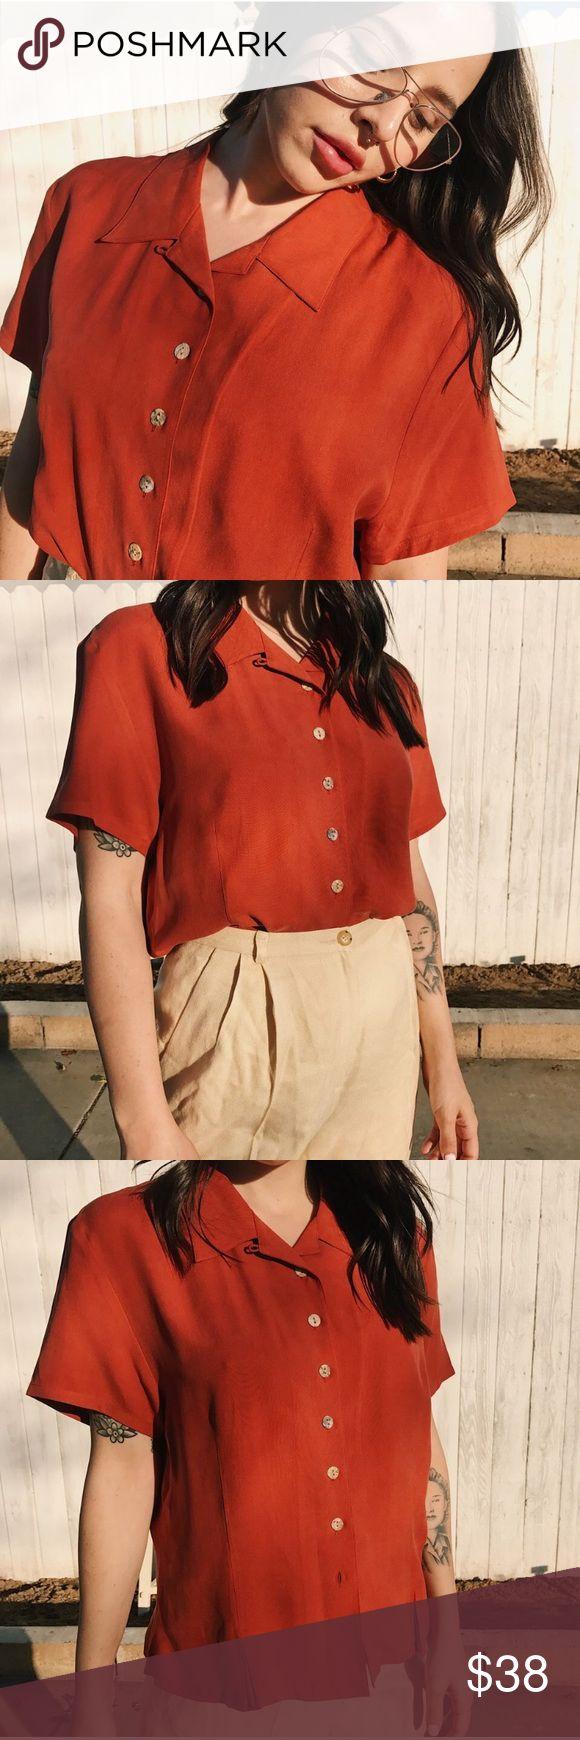 100% Silk Vintage Burnt Orange Short Sleeve Top 100% Silk Vintage Burnt Orange Short Sleeve Top. Beautiful condition, beautiful buttons Vintage Tops Button Down Shirts